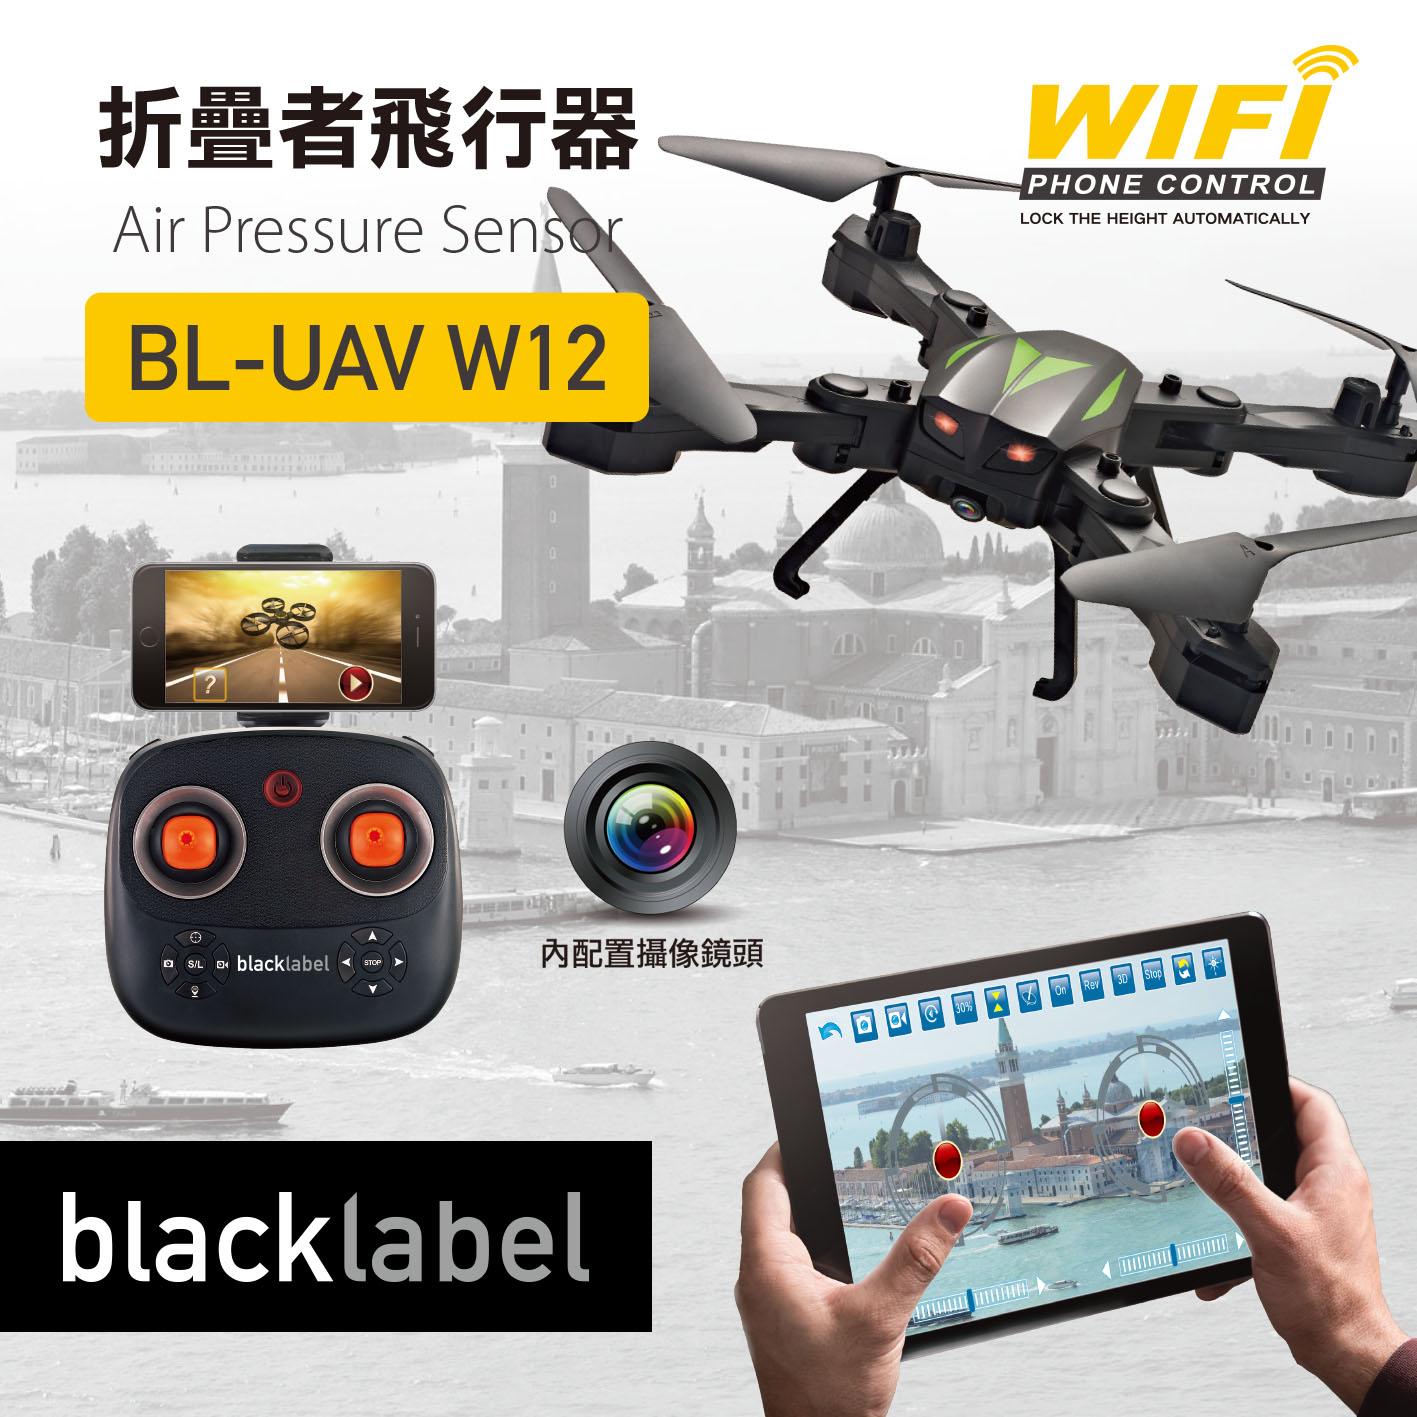 blacklabel 折疊者飛行器 BL-UAV W12